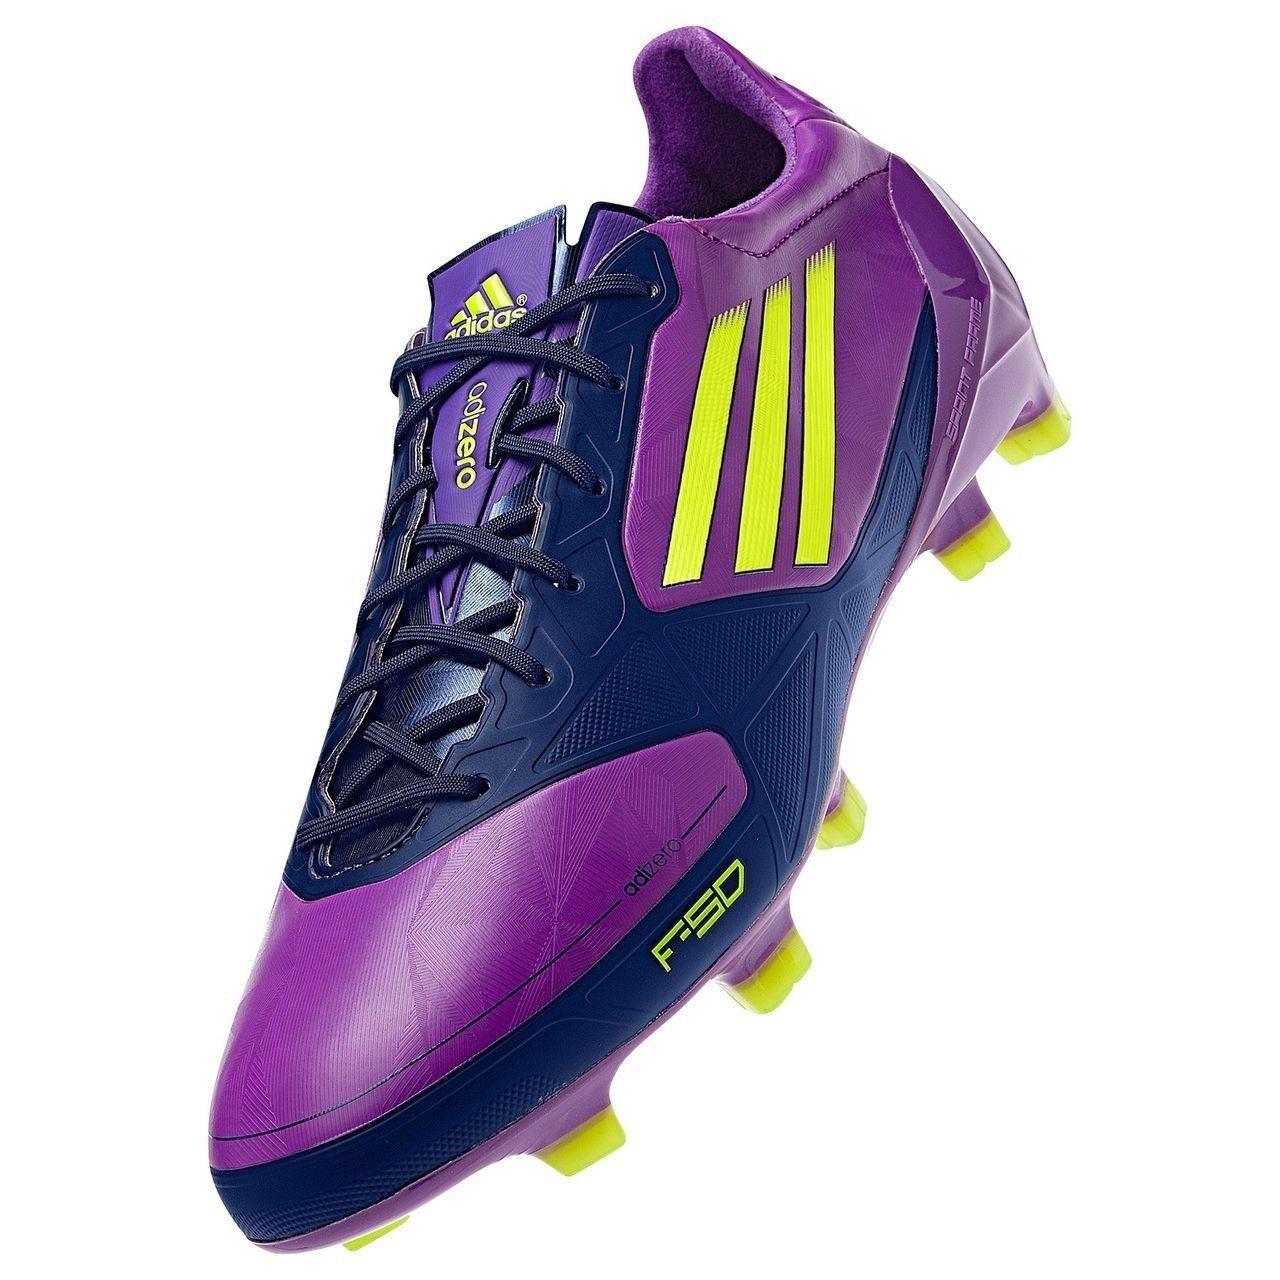 f50 adizero violet